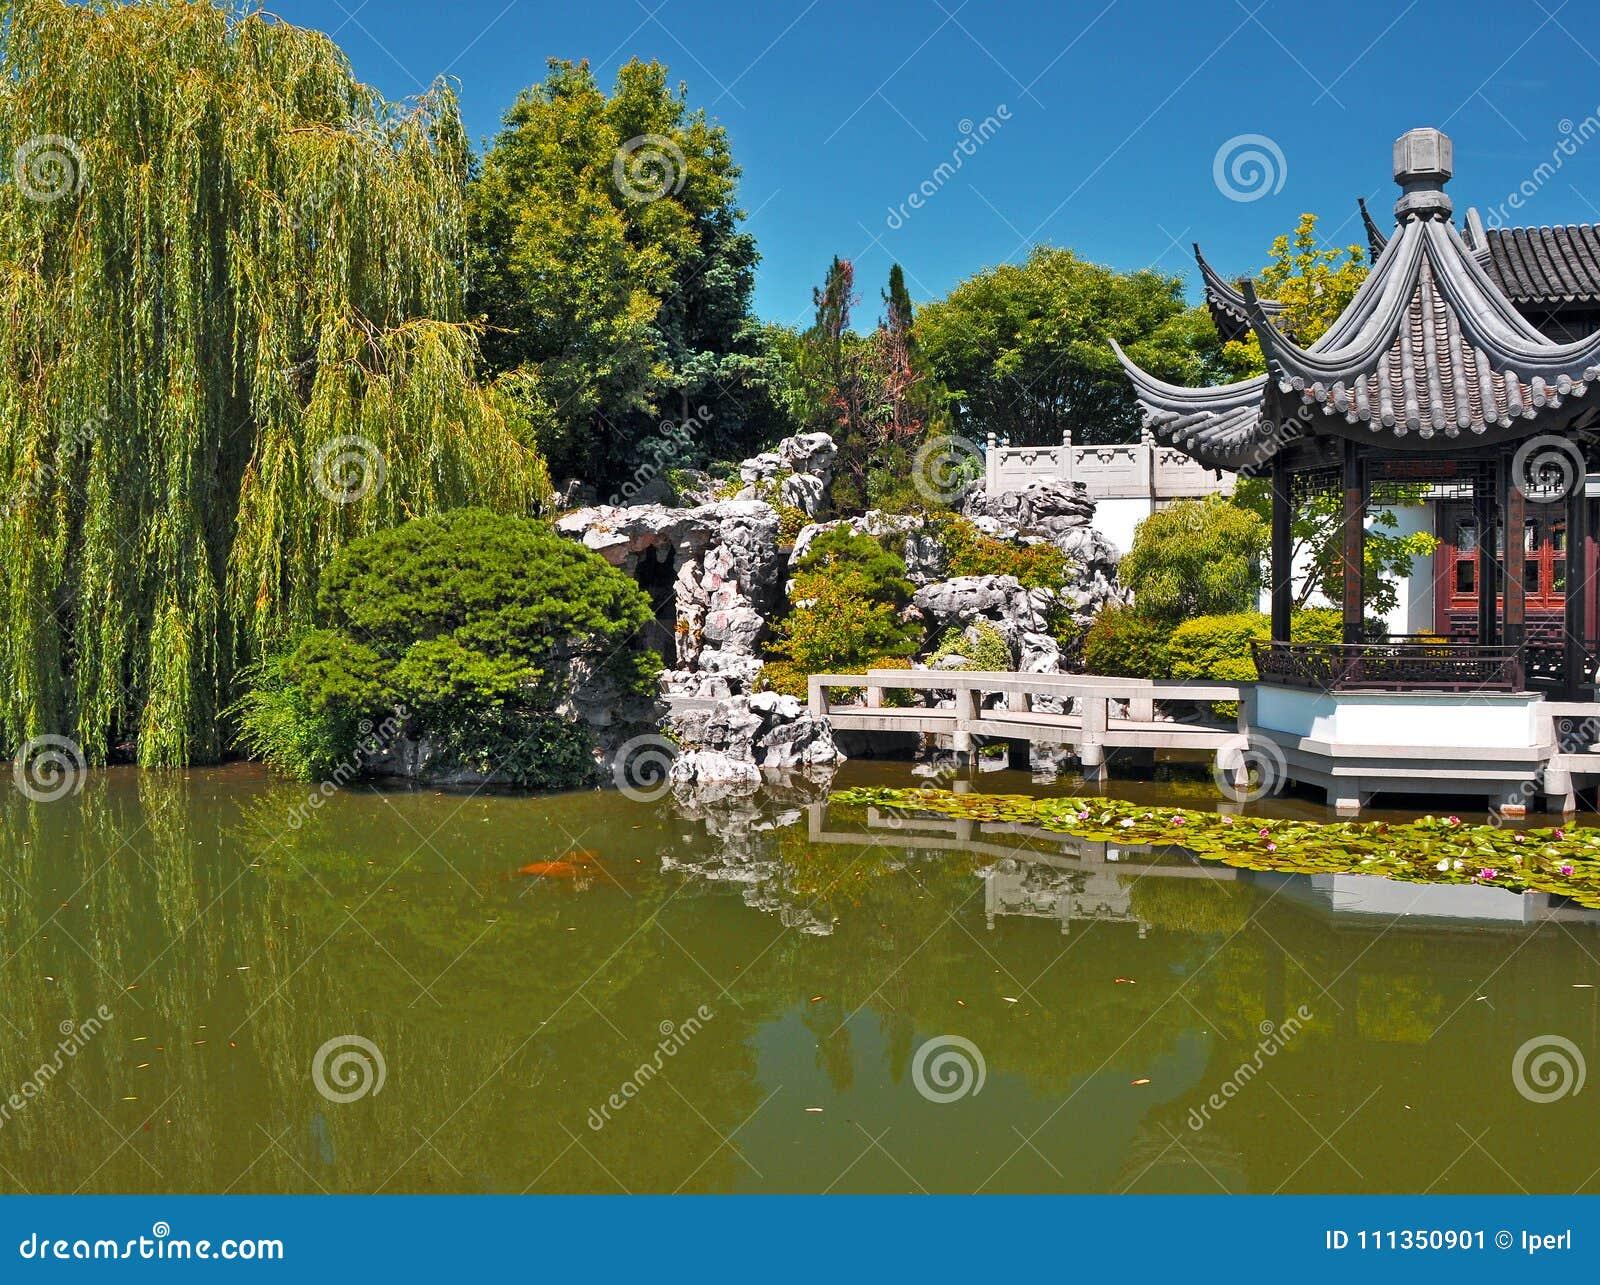 portland lan su chinese garden stock image - image of